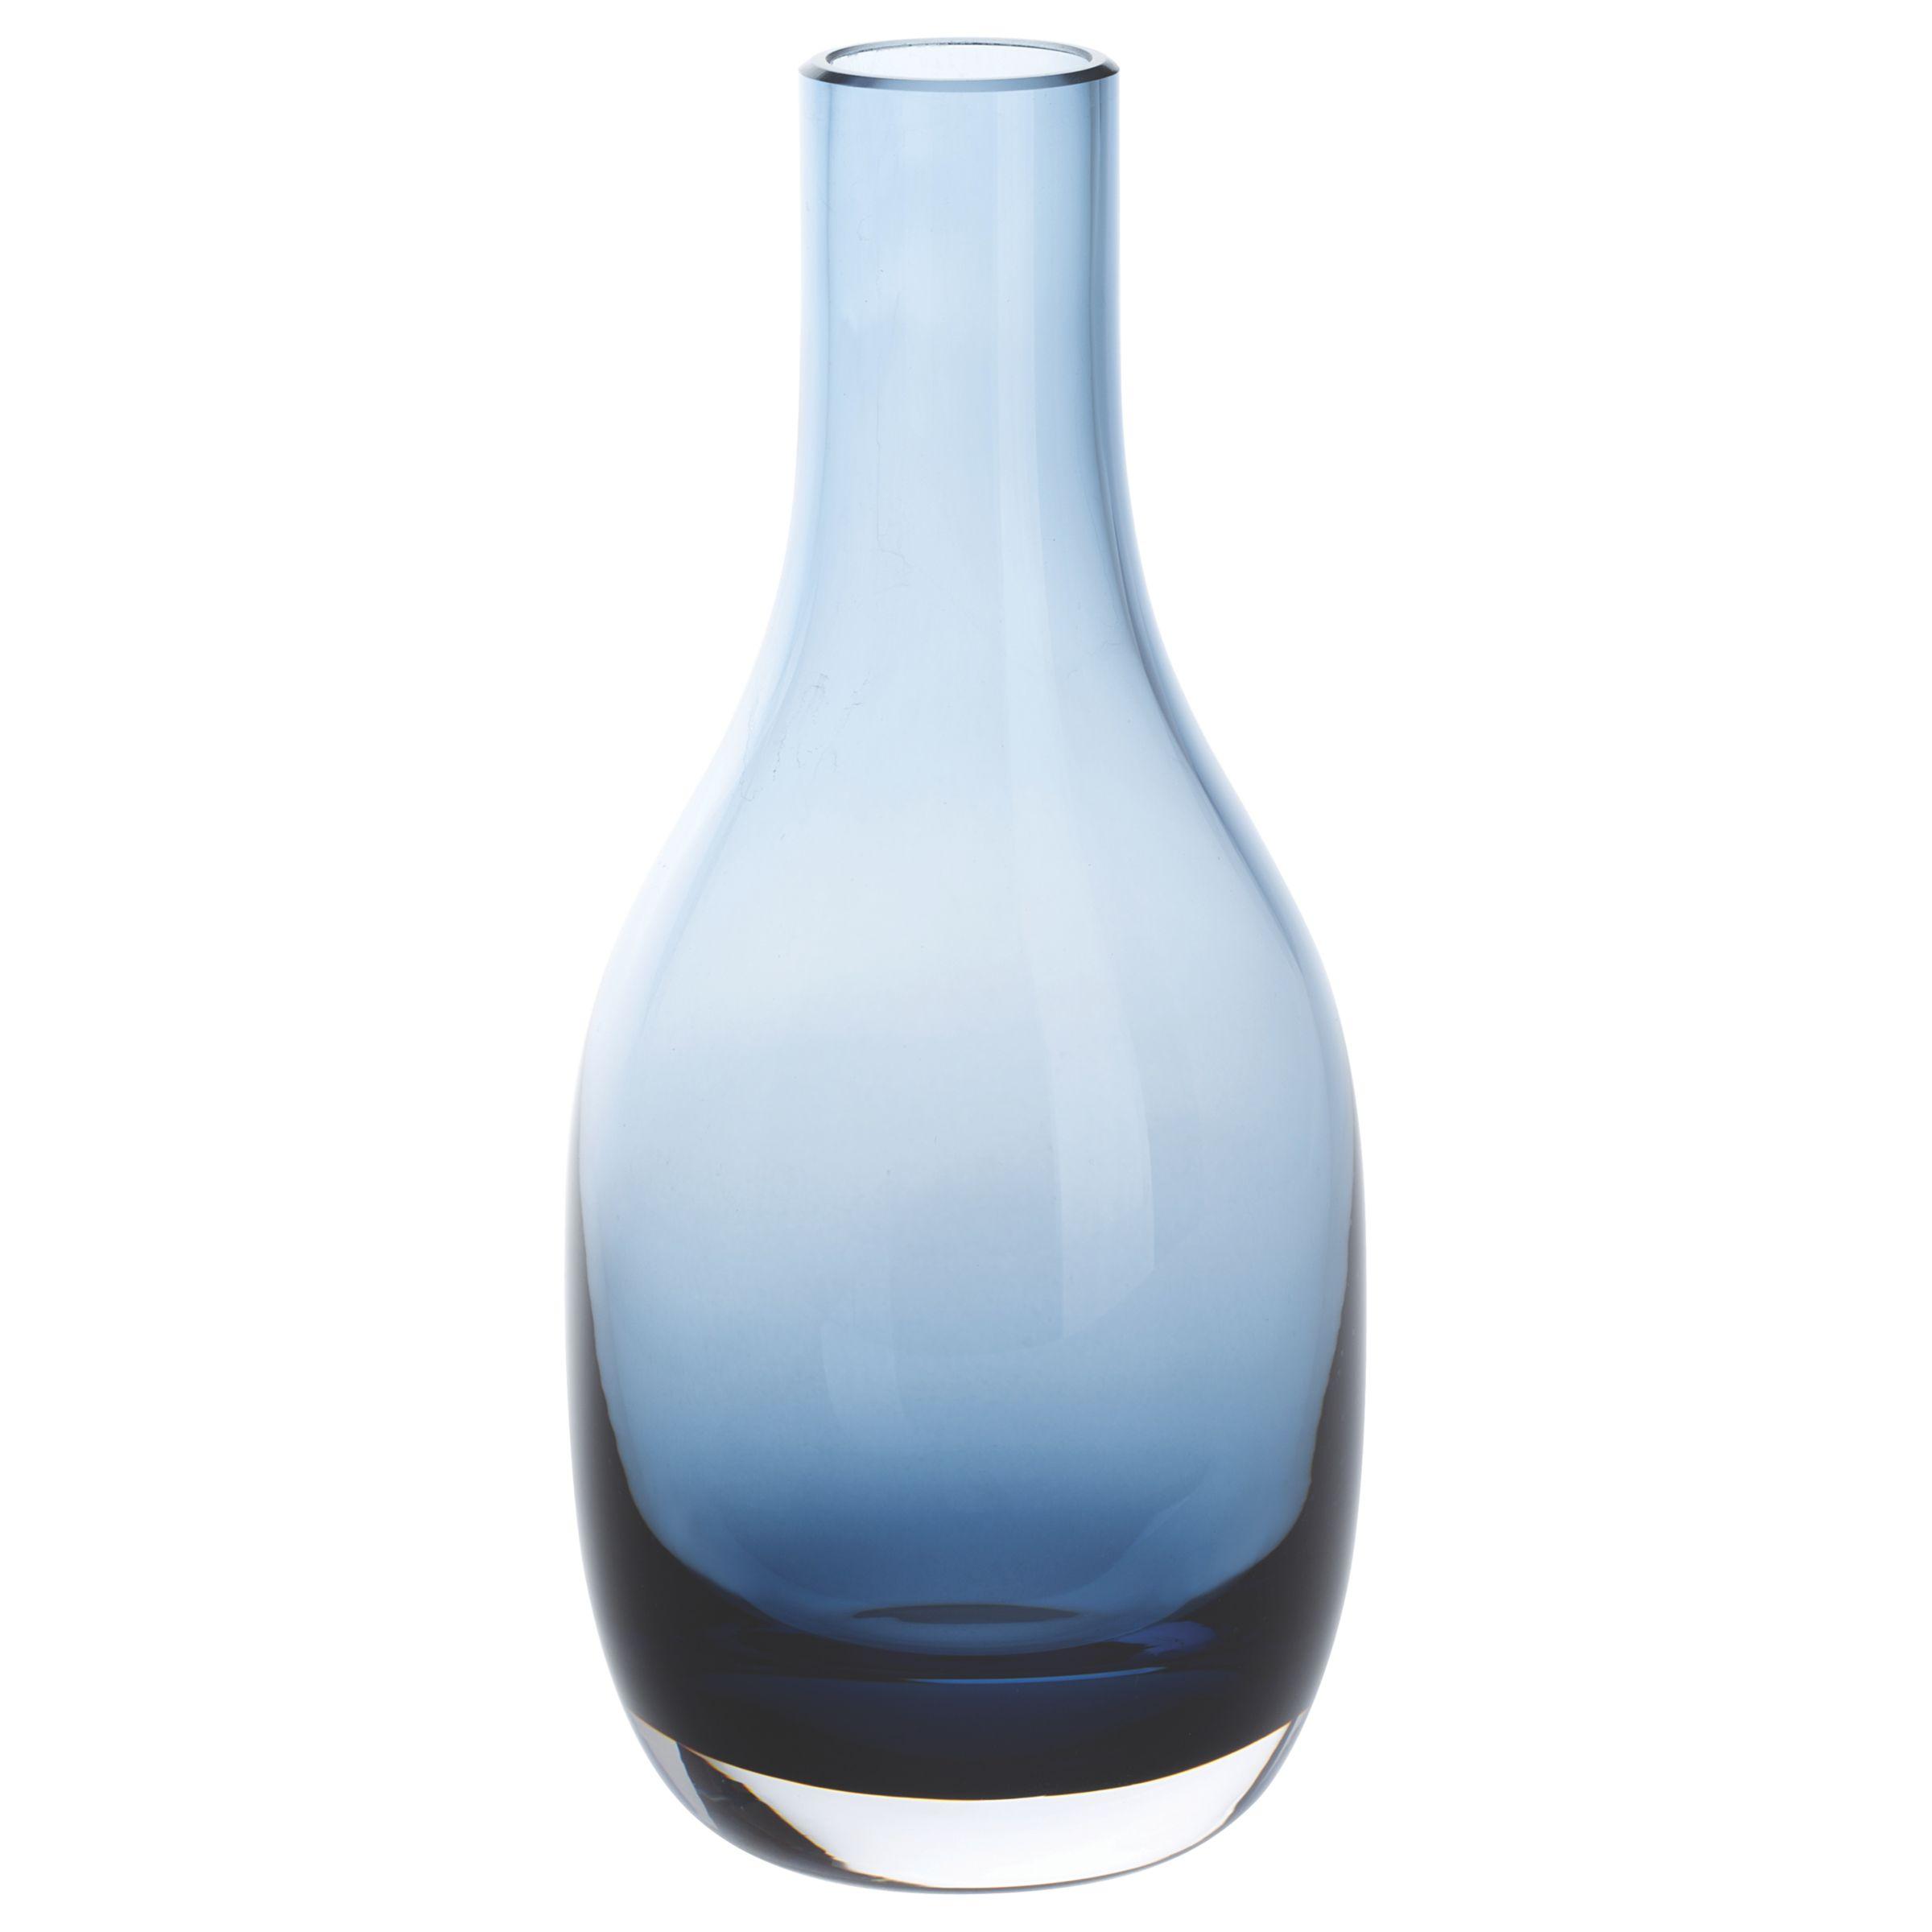 Dartington Crystal Dartington Crystal Aurora Small Stem Vase, Ink Blue